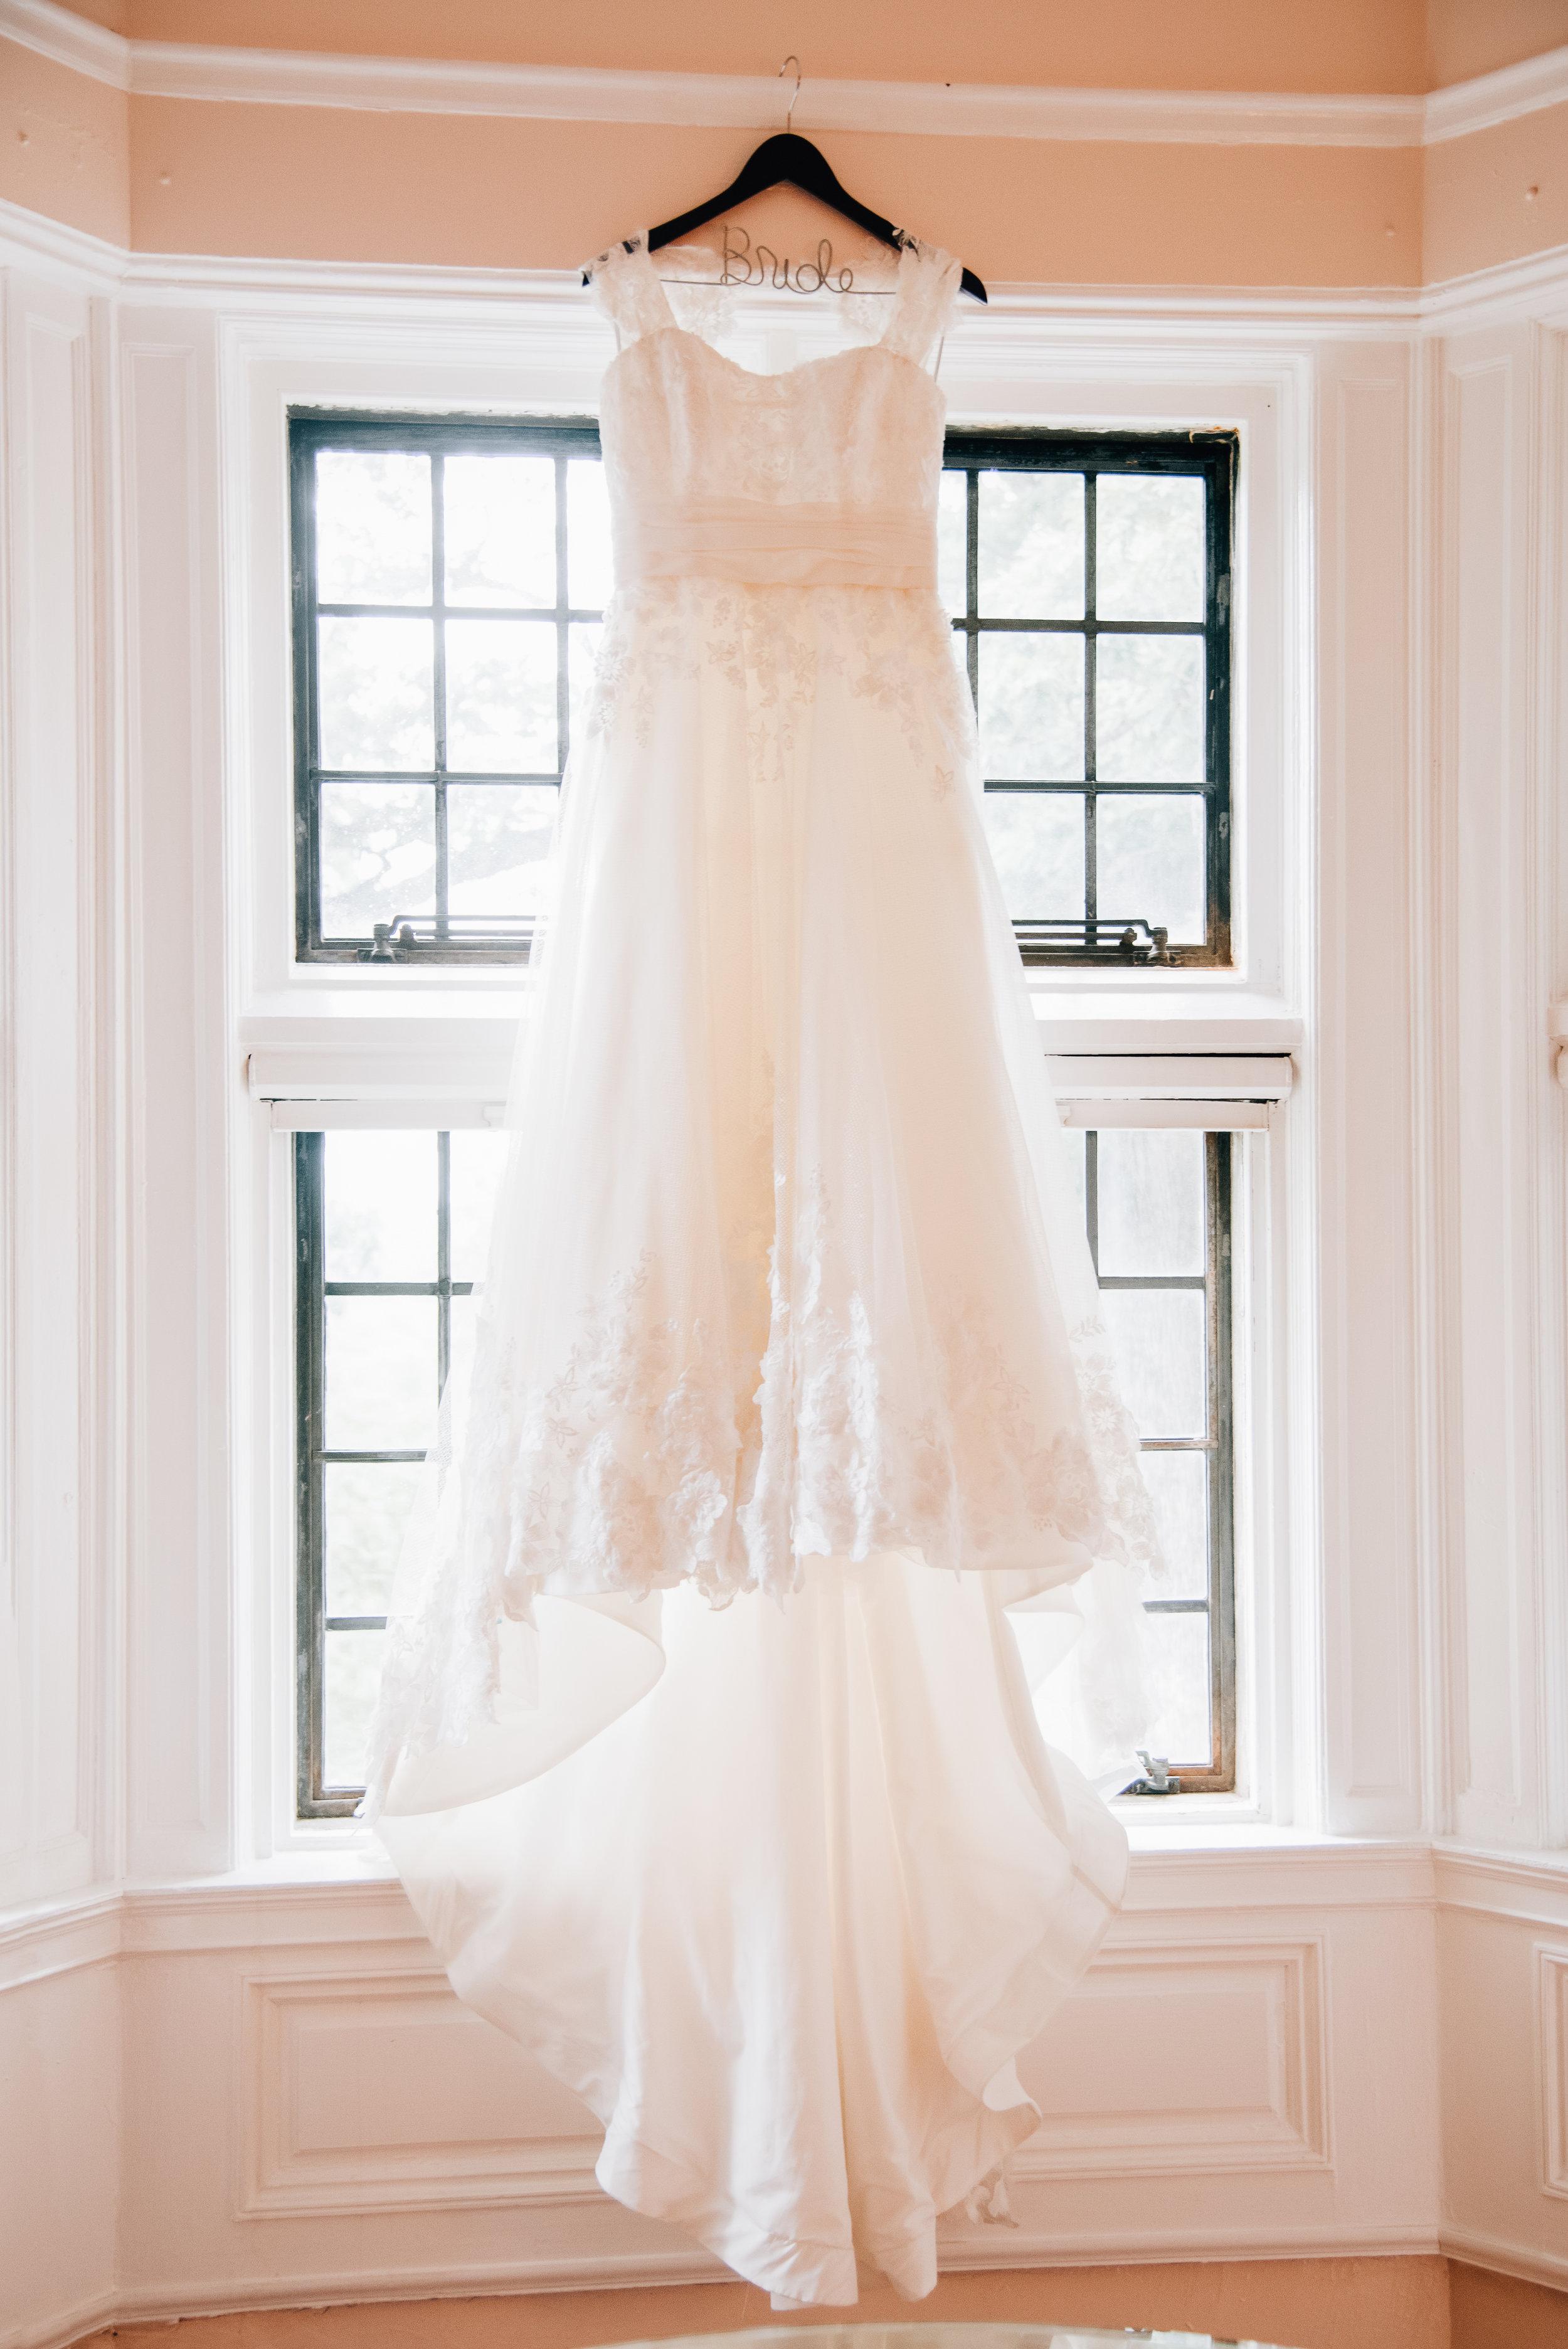 20180828_weddingwebsite_small_8.jpg